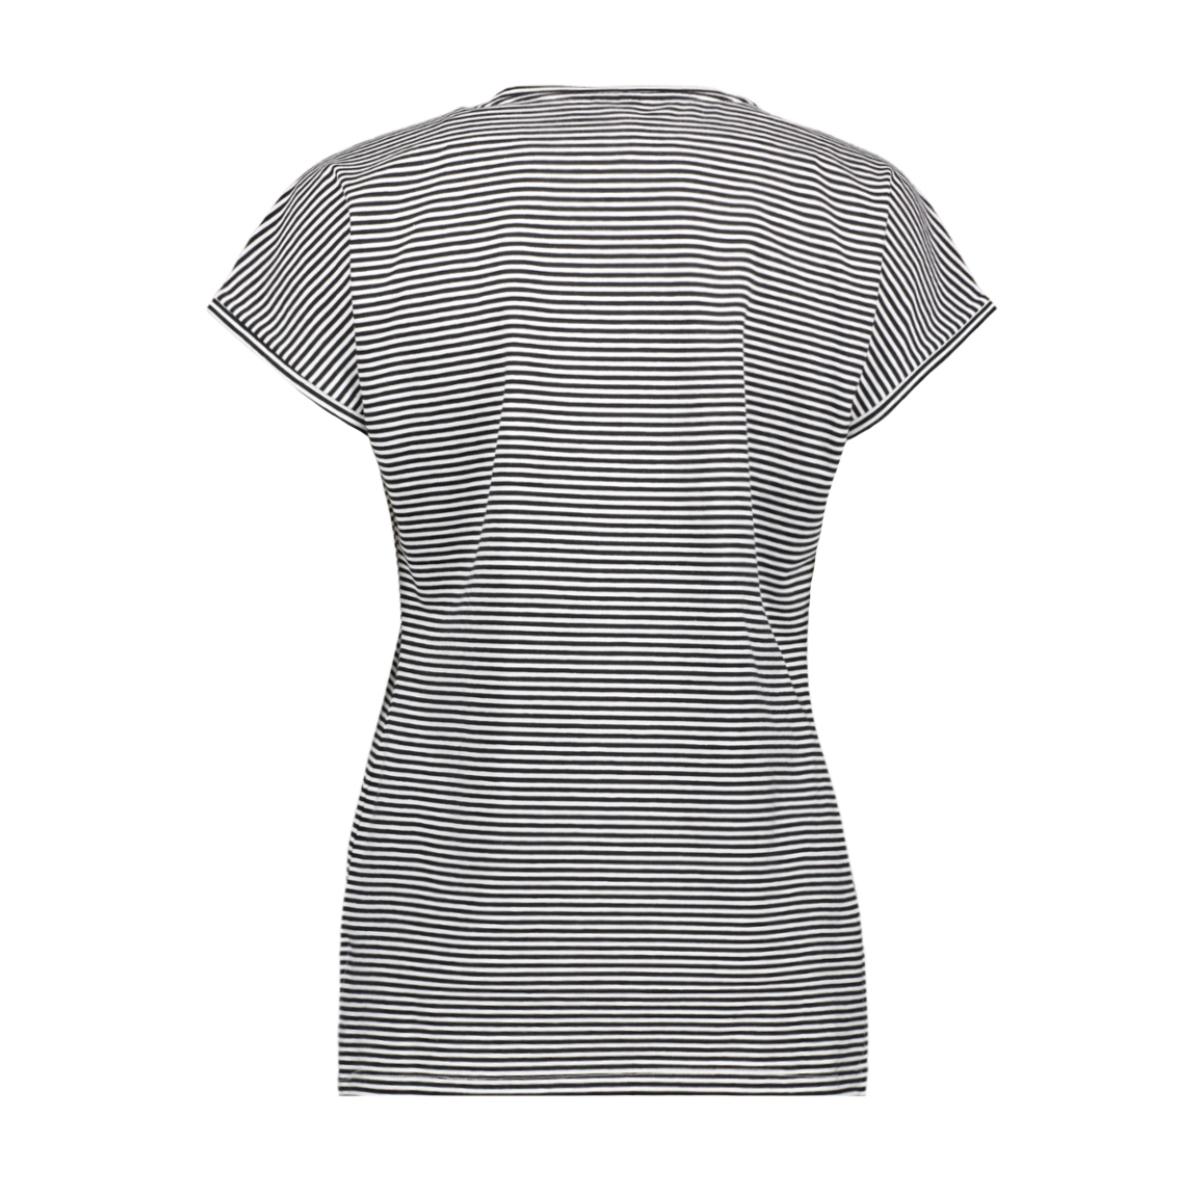 aster t shirt 193 zoso t-shirt black/white